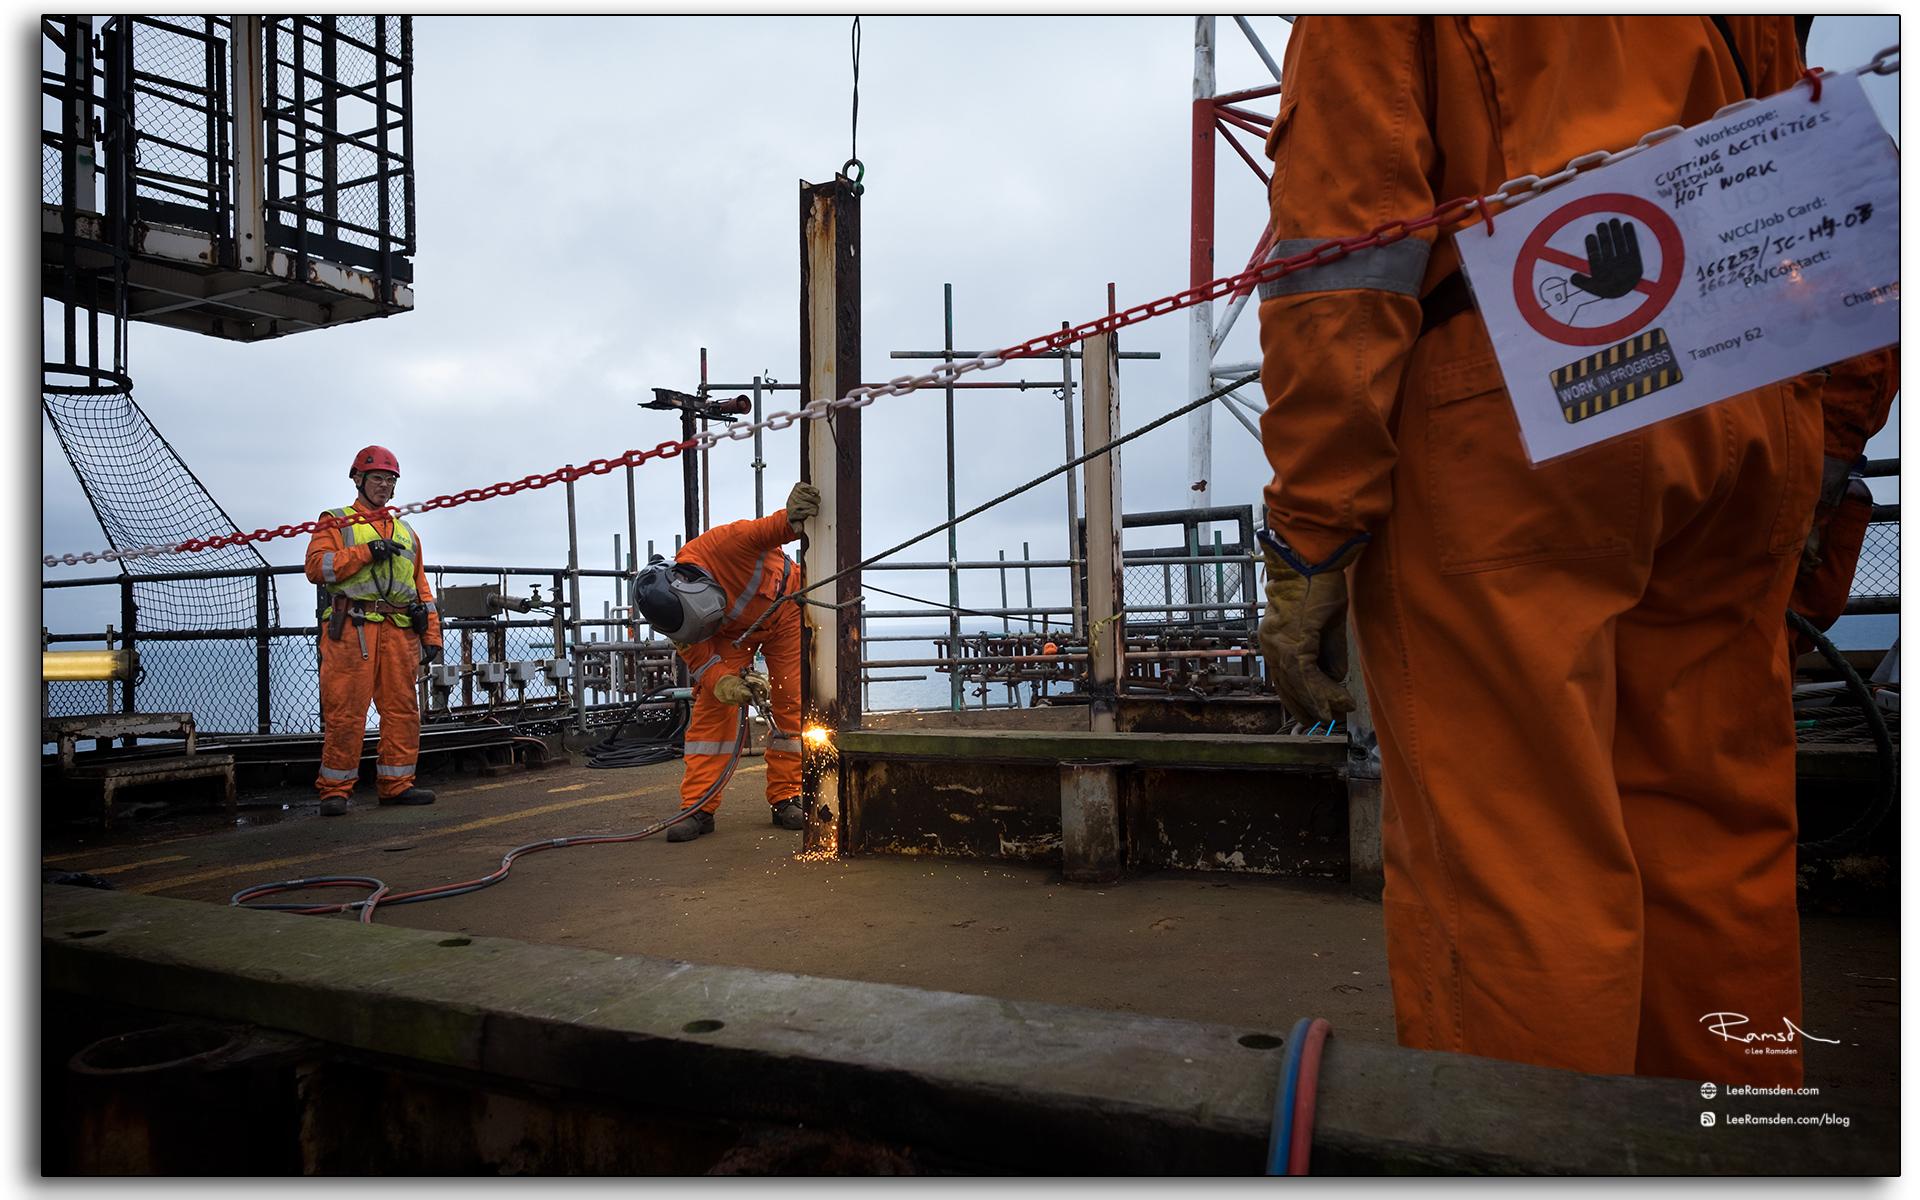 BP Miller, decommissioning, Petrofac, Saipem, barries, chain, lifting, crane, steel beam, BP, buring, oxygen, acetylene, rig removal, industrial, north sea, photo taken by Lee Ramsden